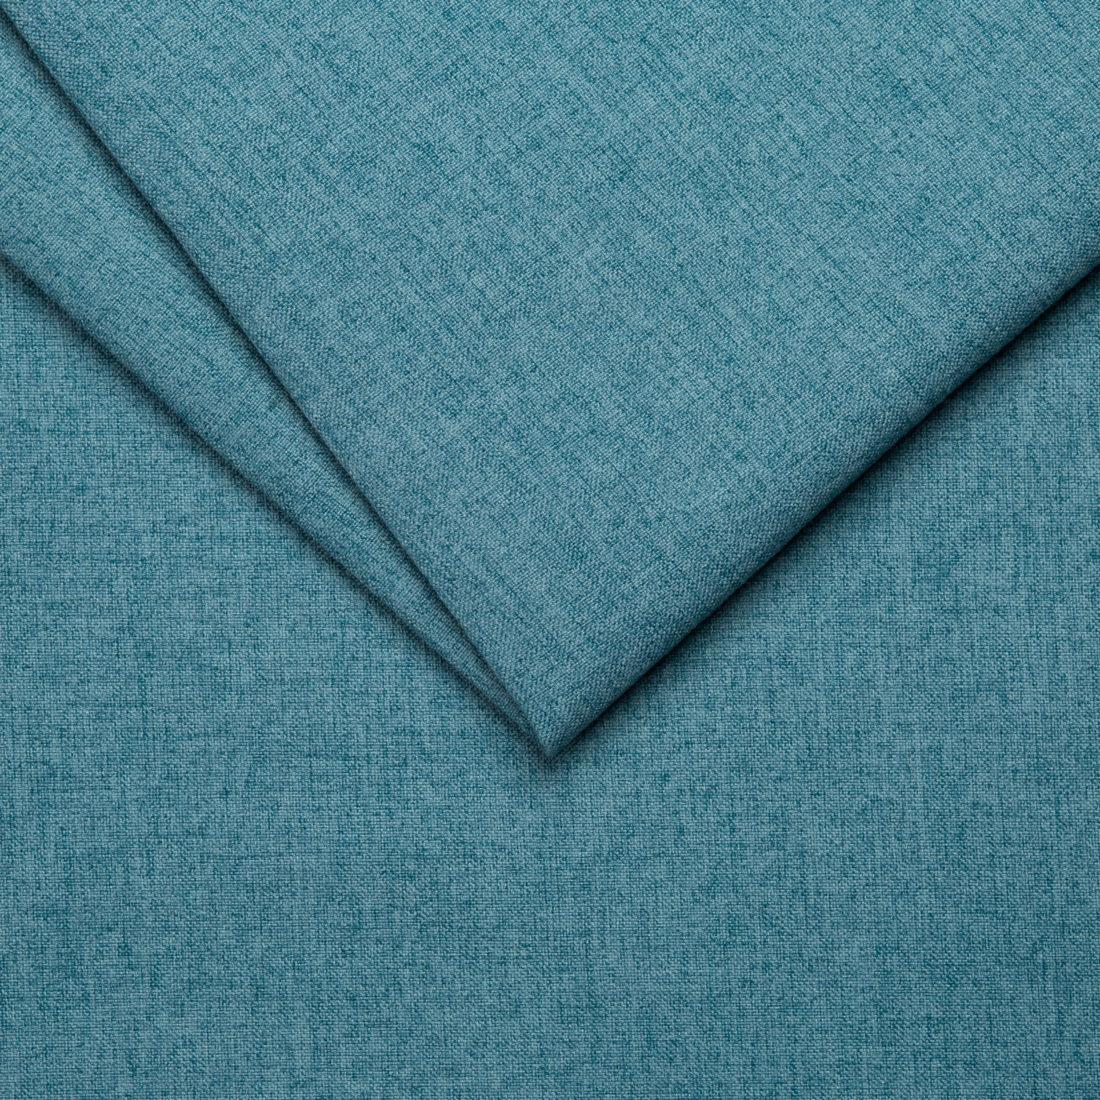 Меблева тканина Cashmere 15 Petrol, рогожка